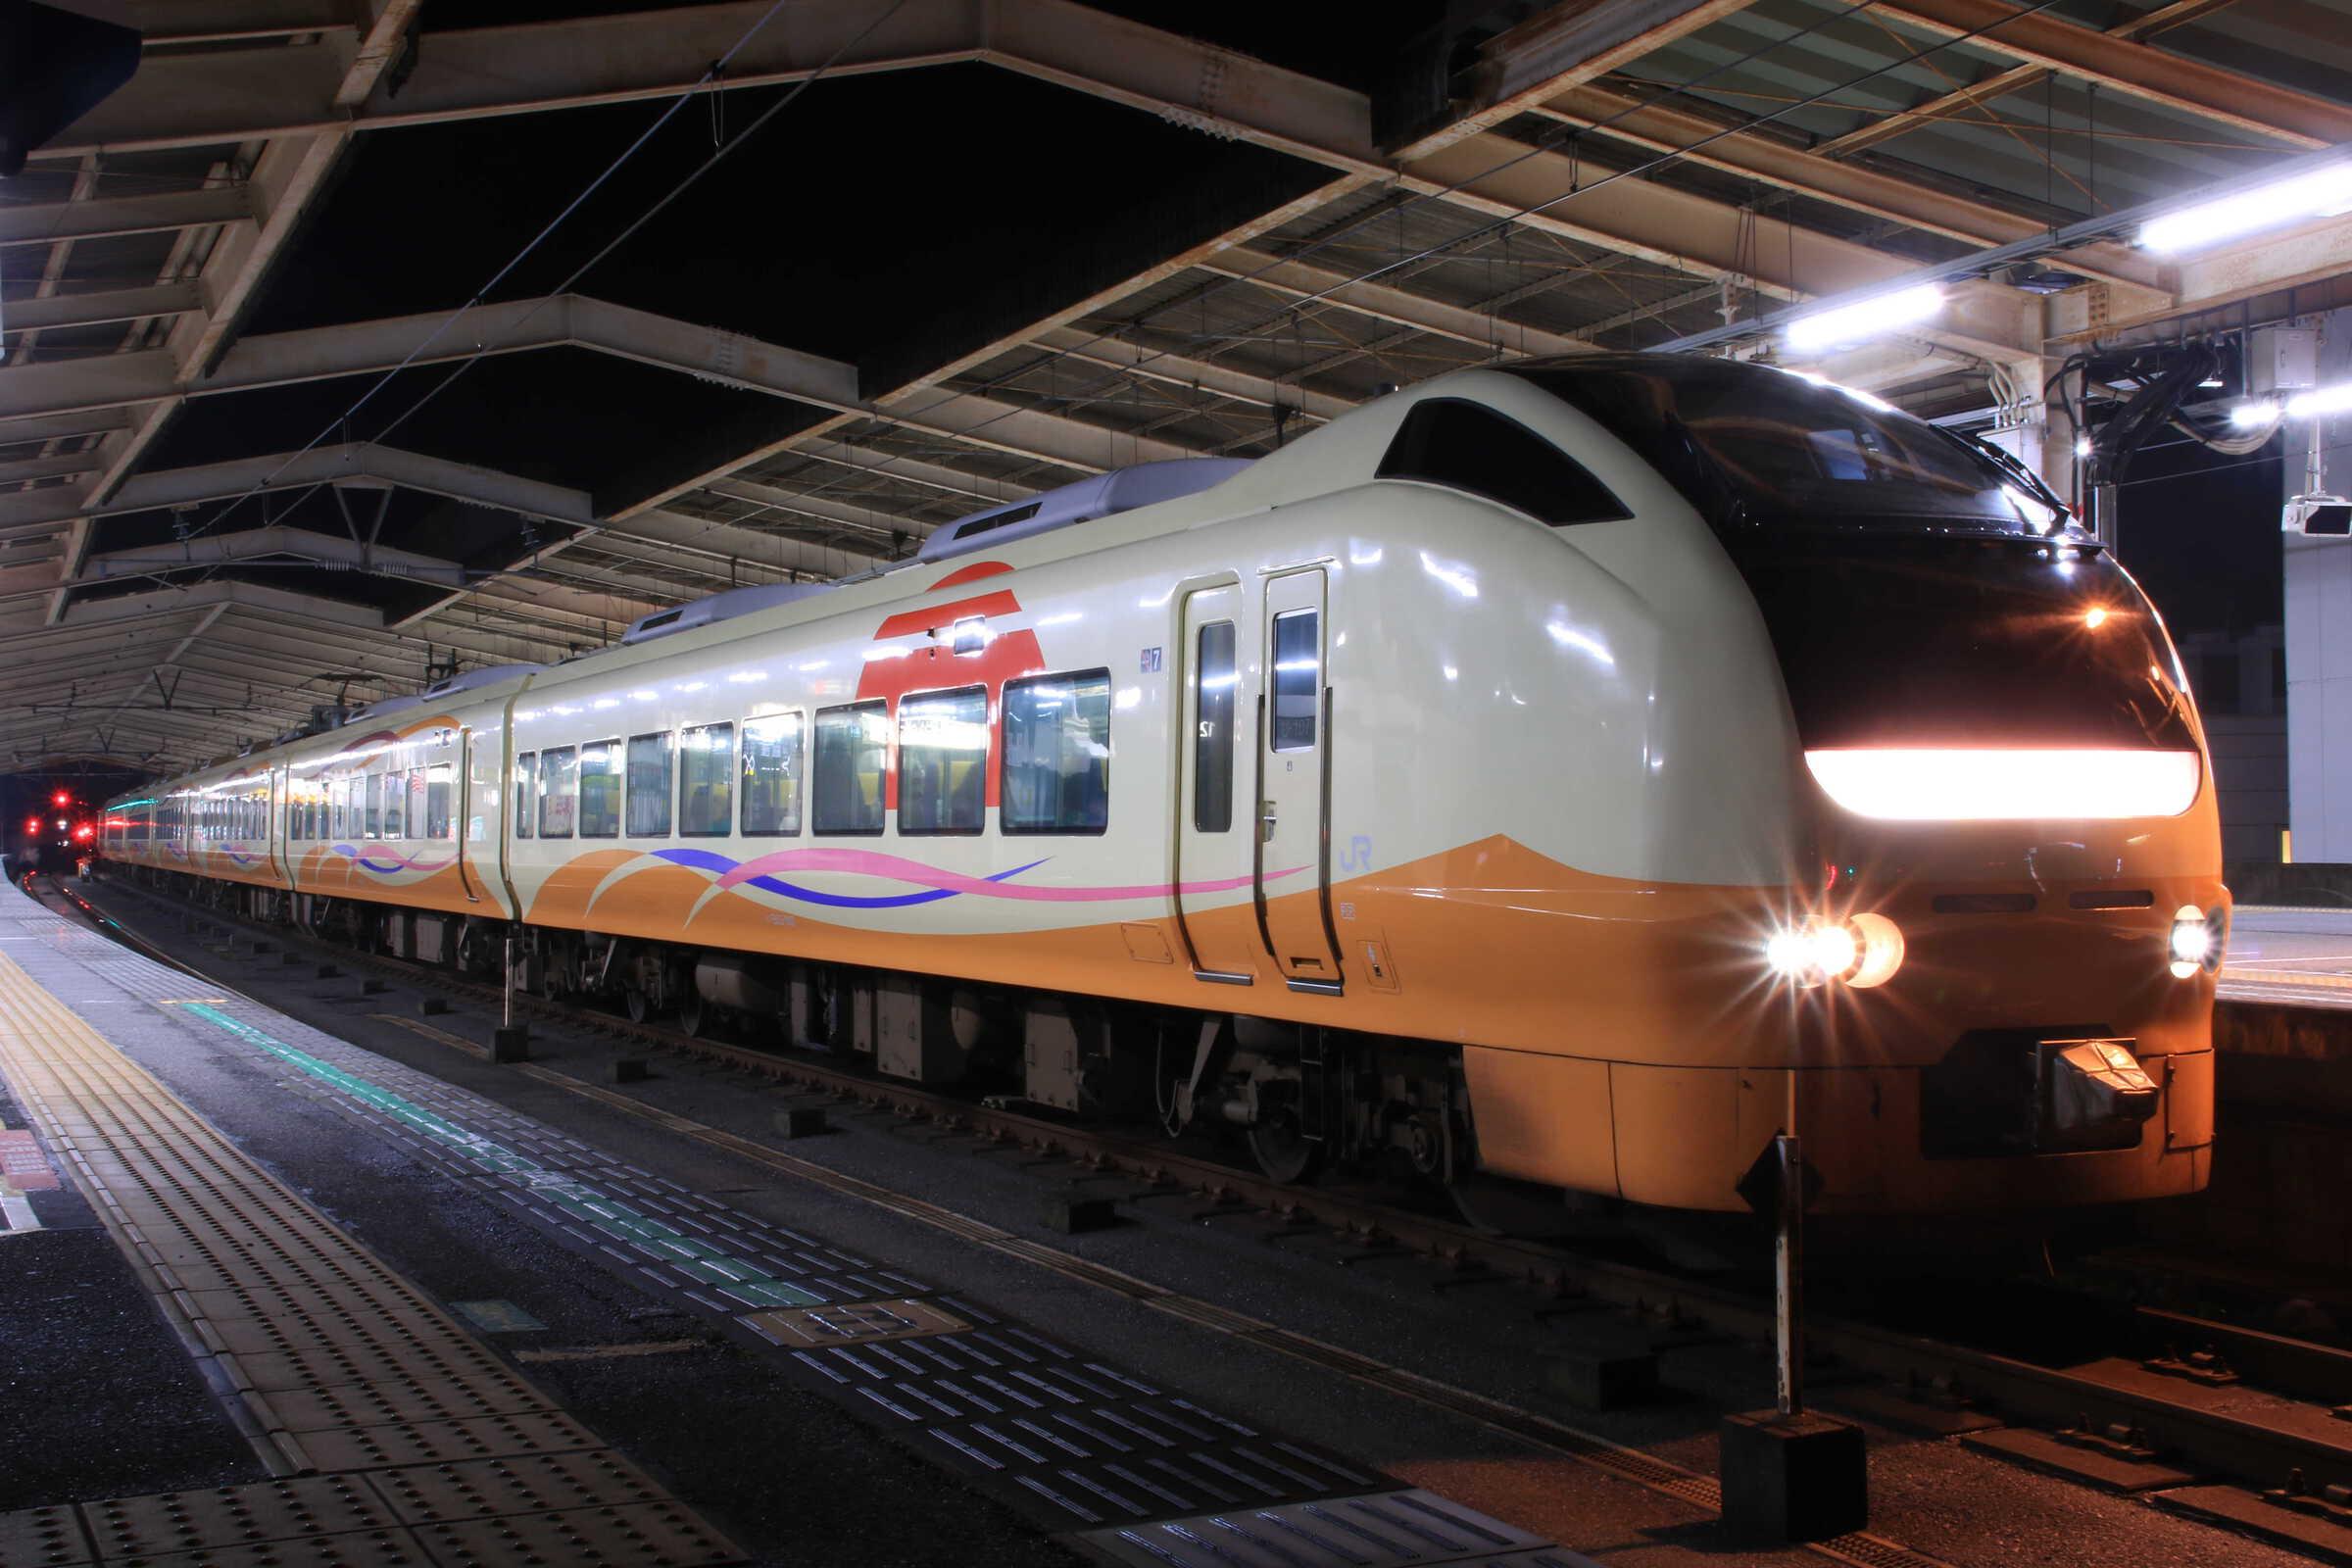 9738M 団臨(秋1101, 東京(舞浜)→新潟) スターライト舞浜号 E653系 新ニイU-107編成